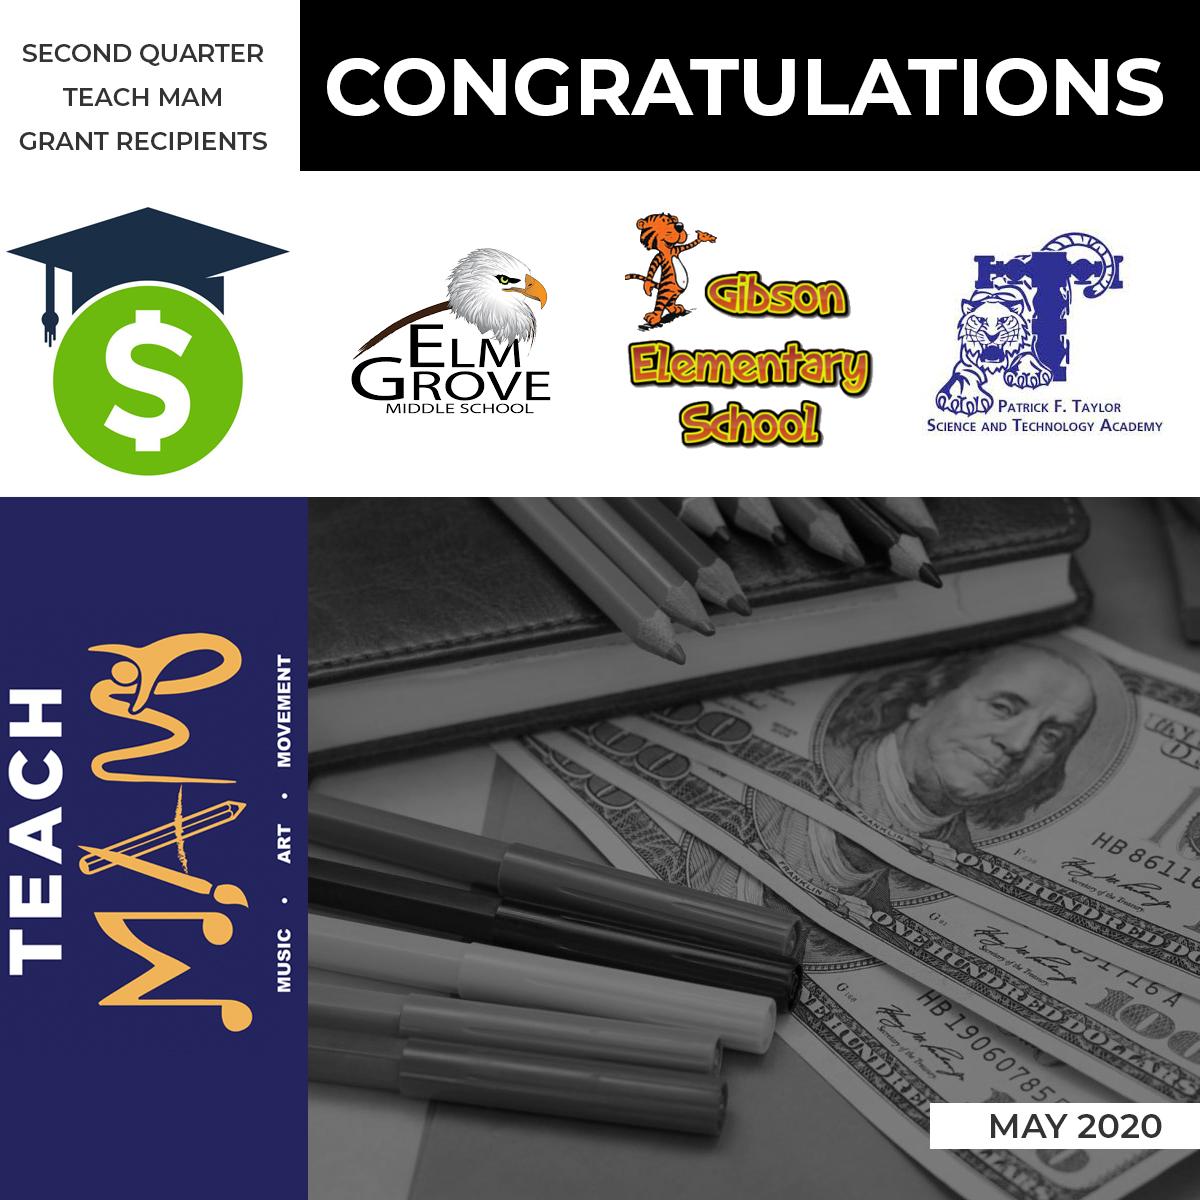 Teach MAM – Second Quarter Grant Recipients